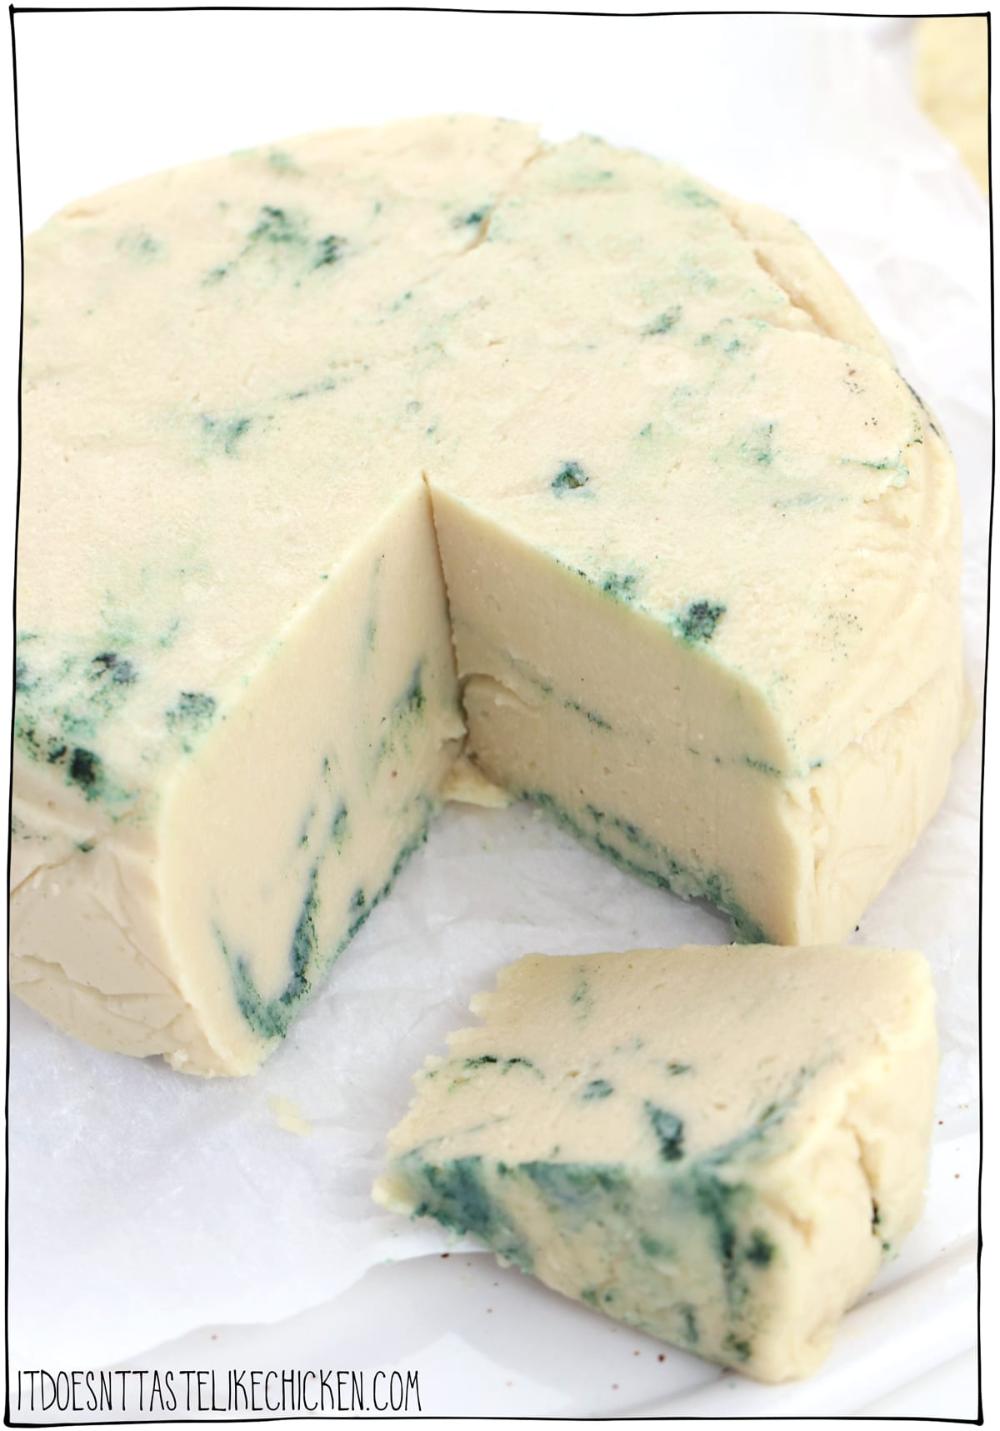 Easy Vegan Blue Cheese Recipe Recipe In 2020 Blue Cheese Recipes Cheese Recipes Vegan Blue Cheese Recipe